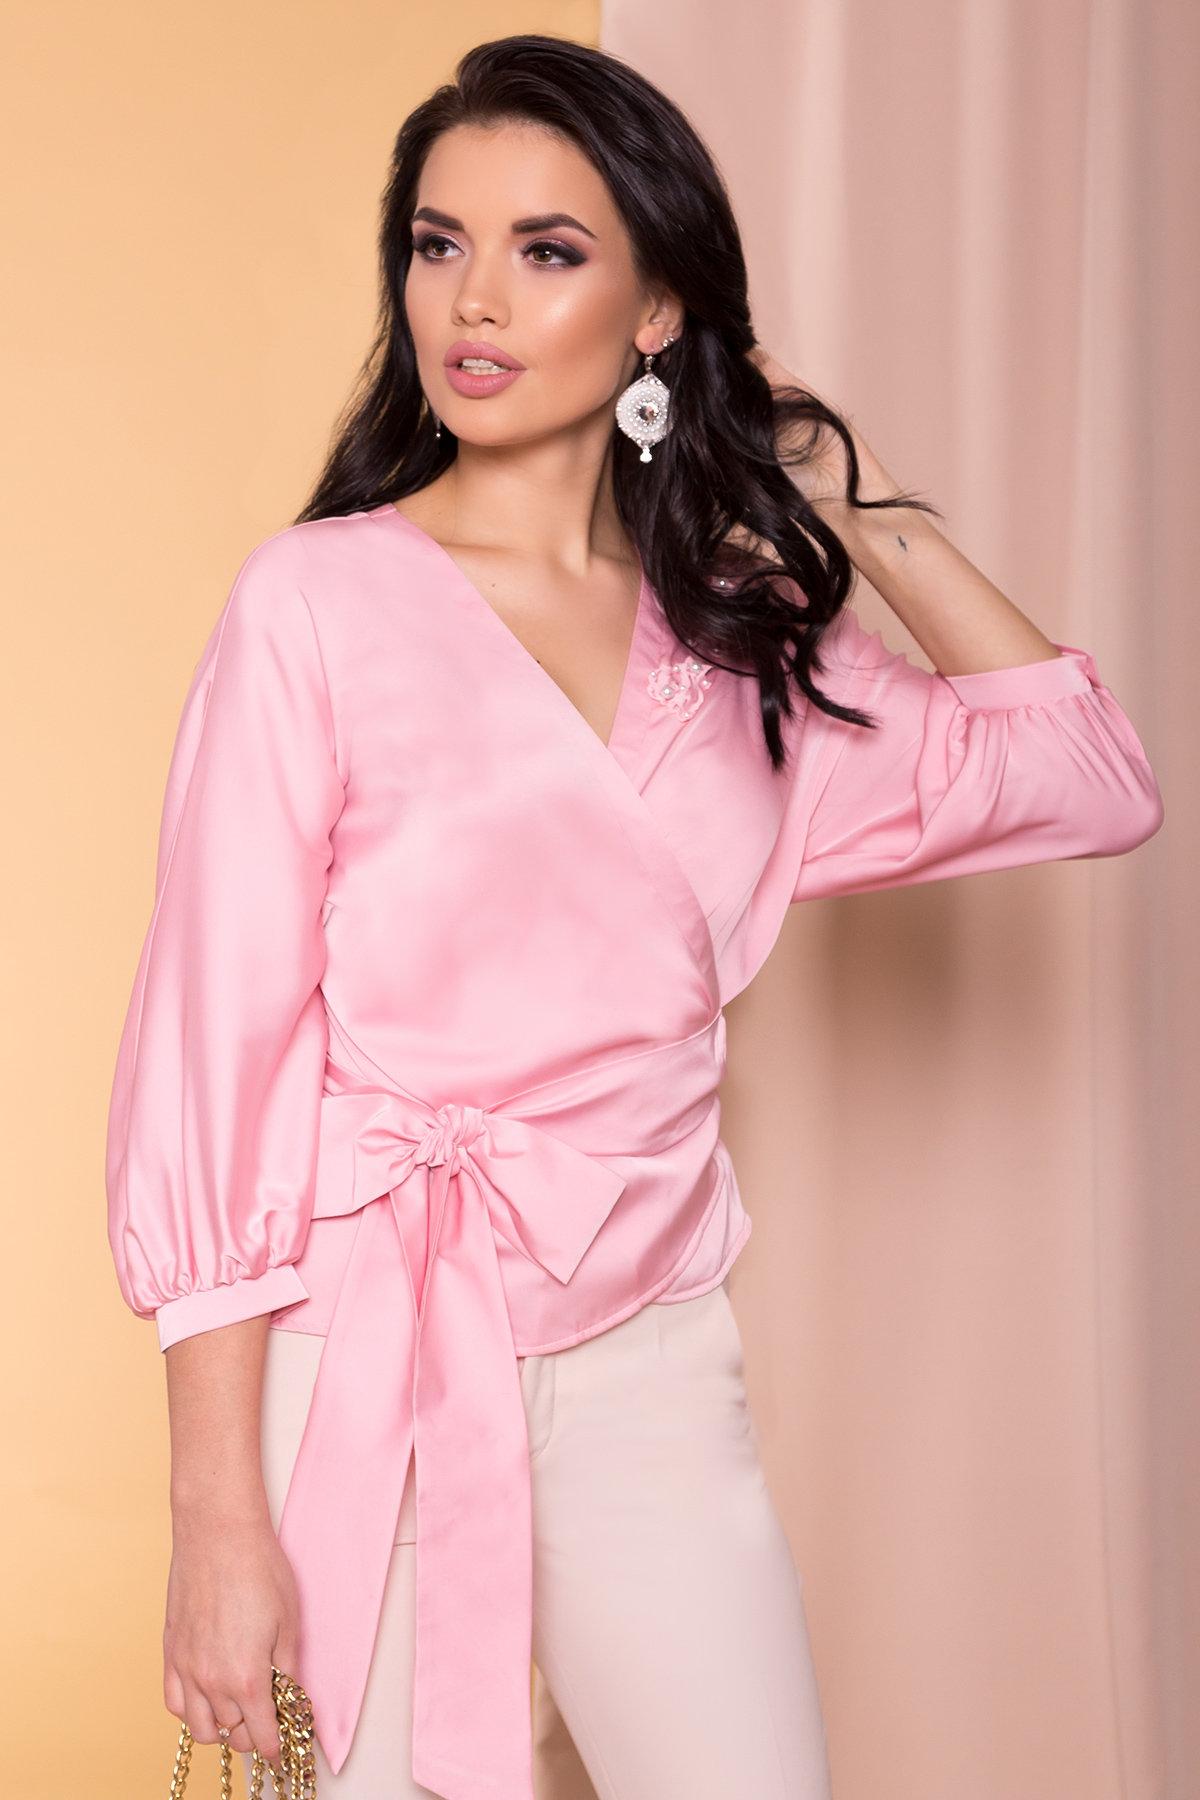 Блуза Олимпия 2304 АРТ. 14926 Цвет: Розовый - фото 3, интернет магазин tm-modus.ru